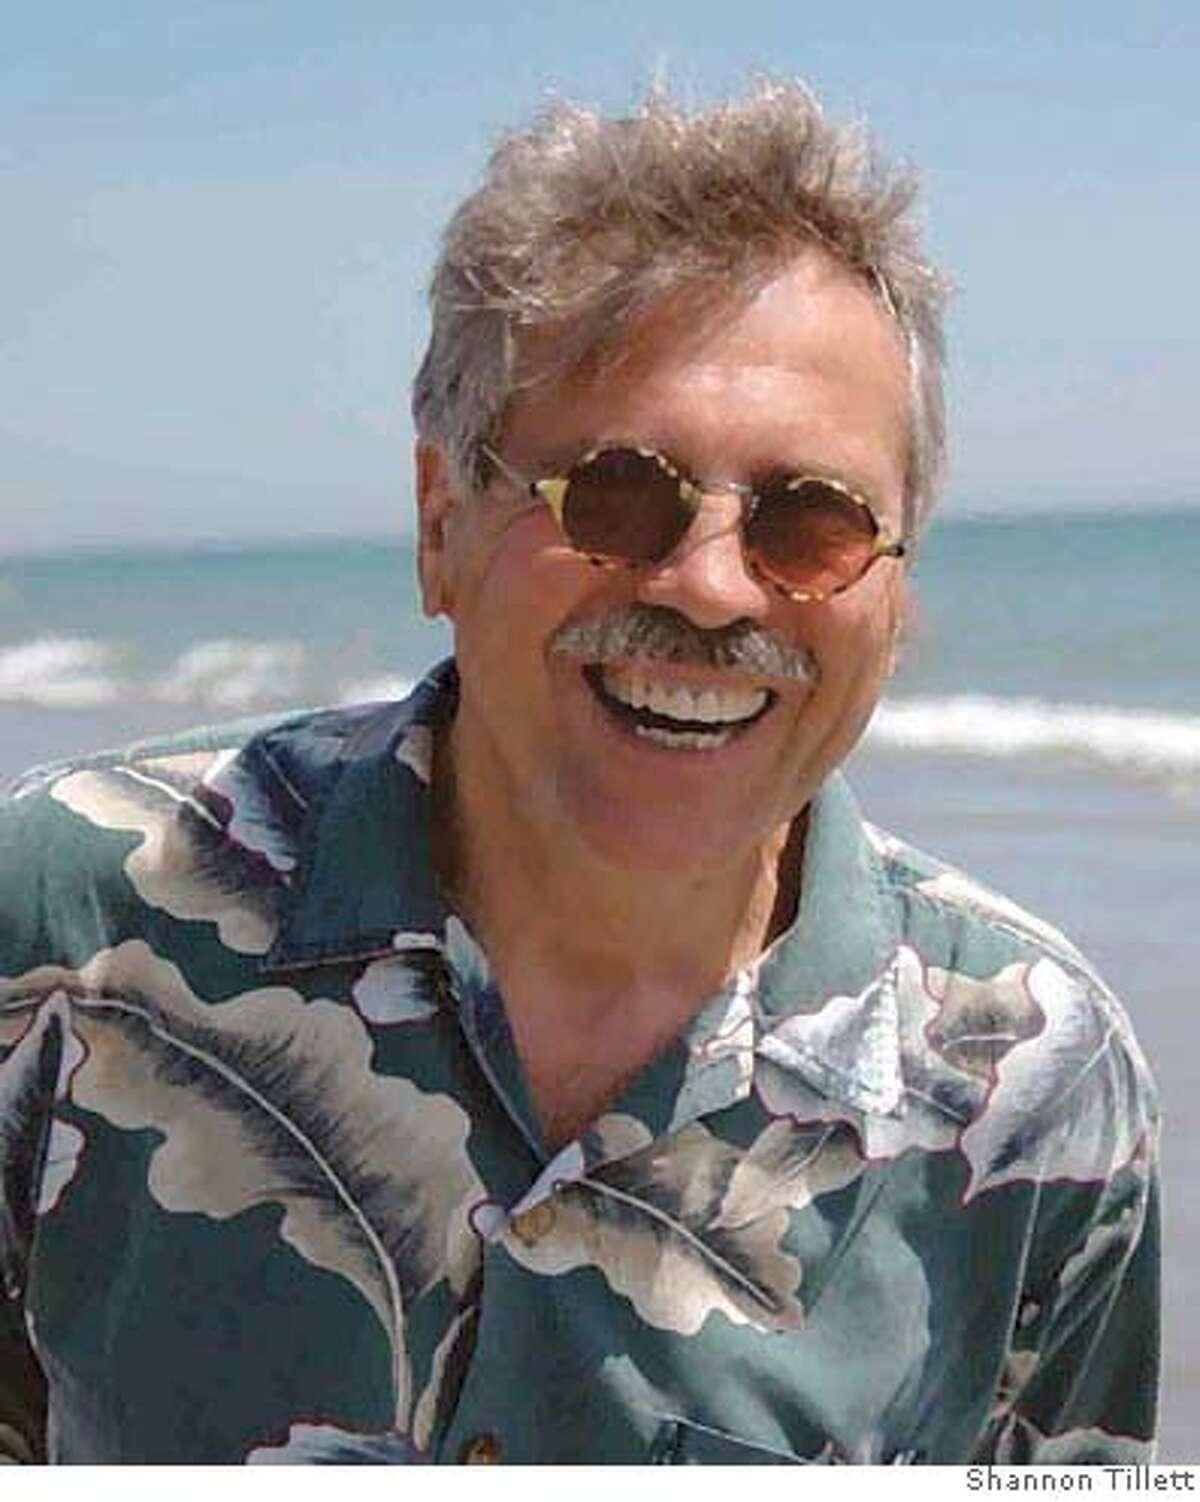 Photo of Rick Carroll. Photo Credit: Shannon Tillett